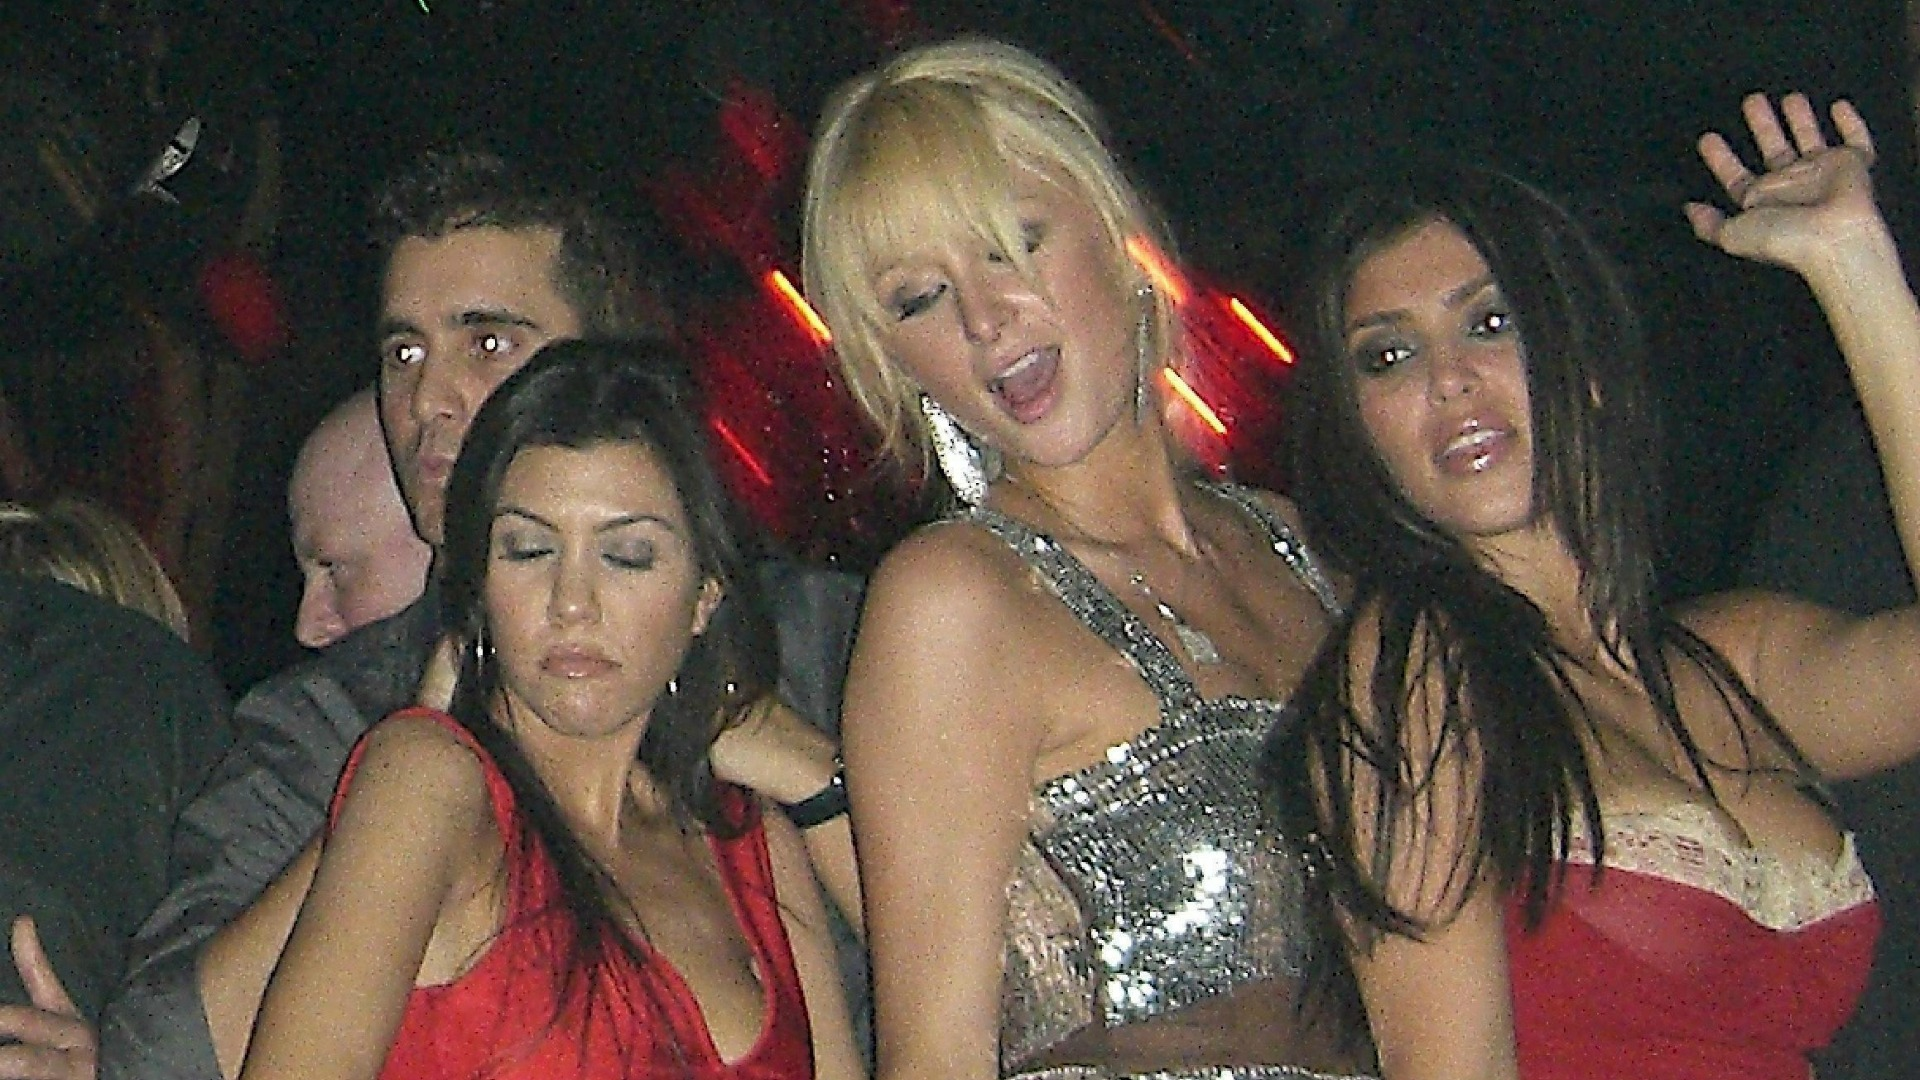 Paris Hilton and Kim Kardashian party in Las Vegas in 2006